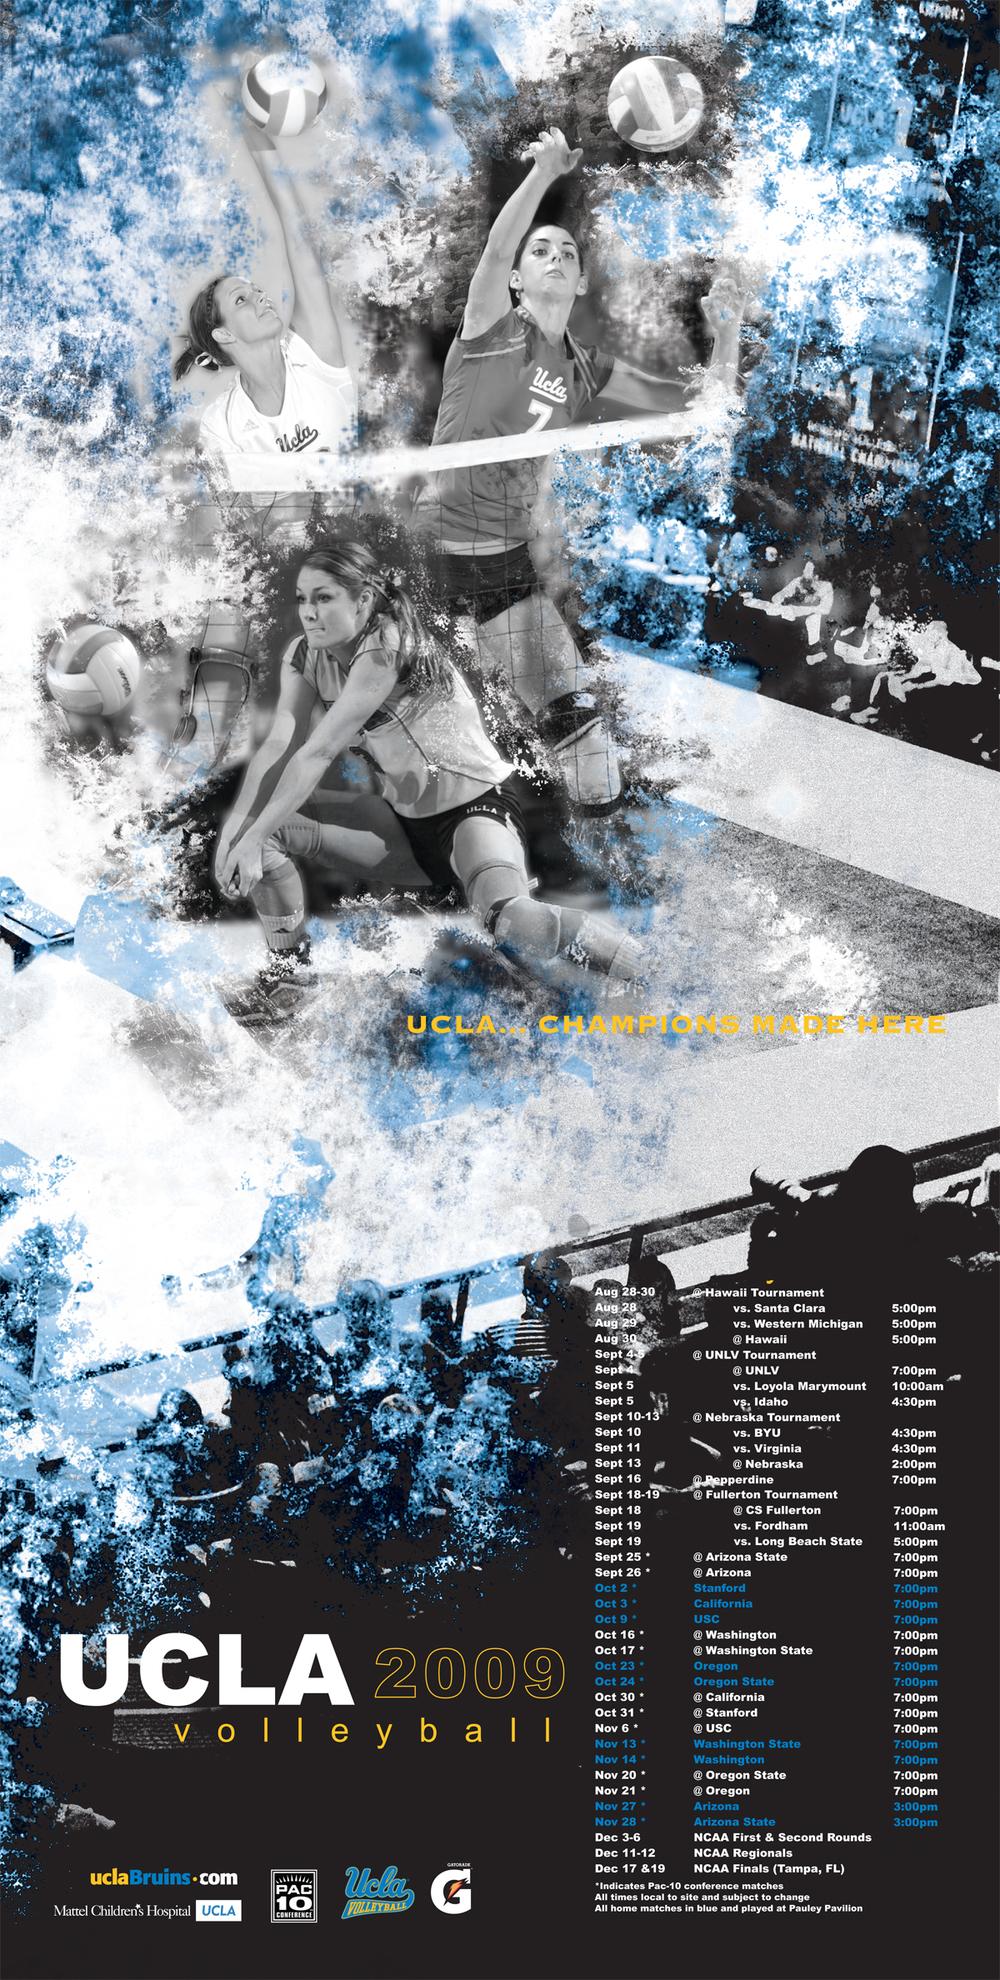 UCLAwomensvolleyballposter1-web.jpg